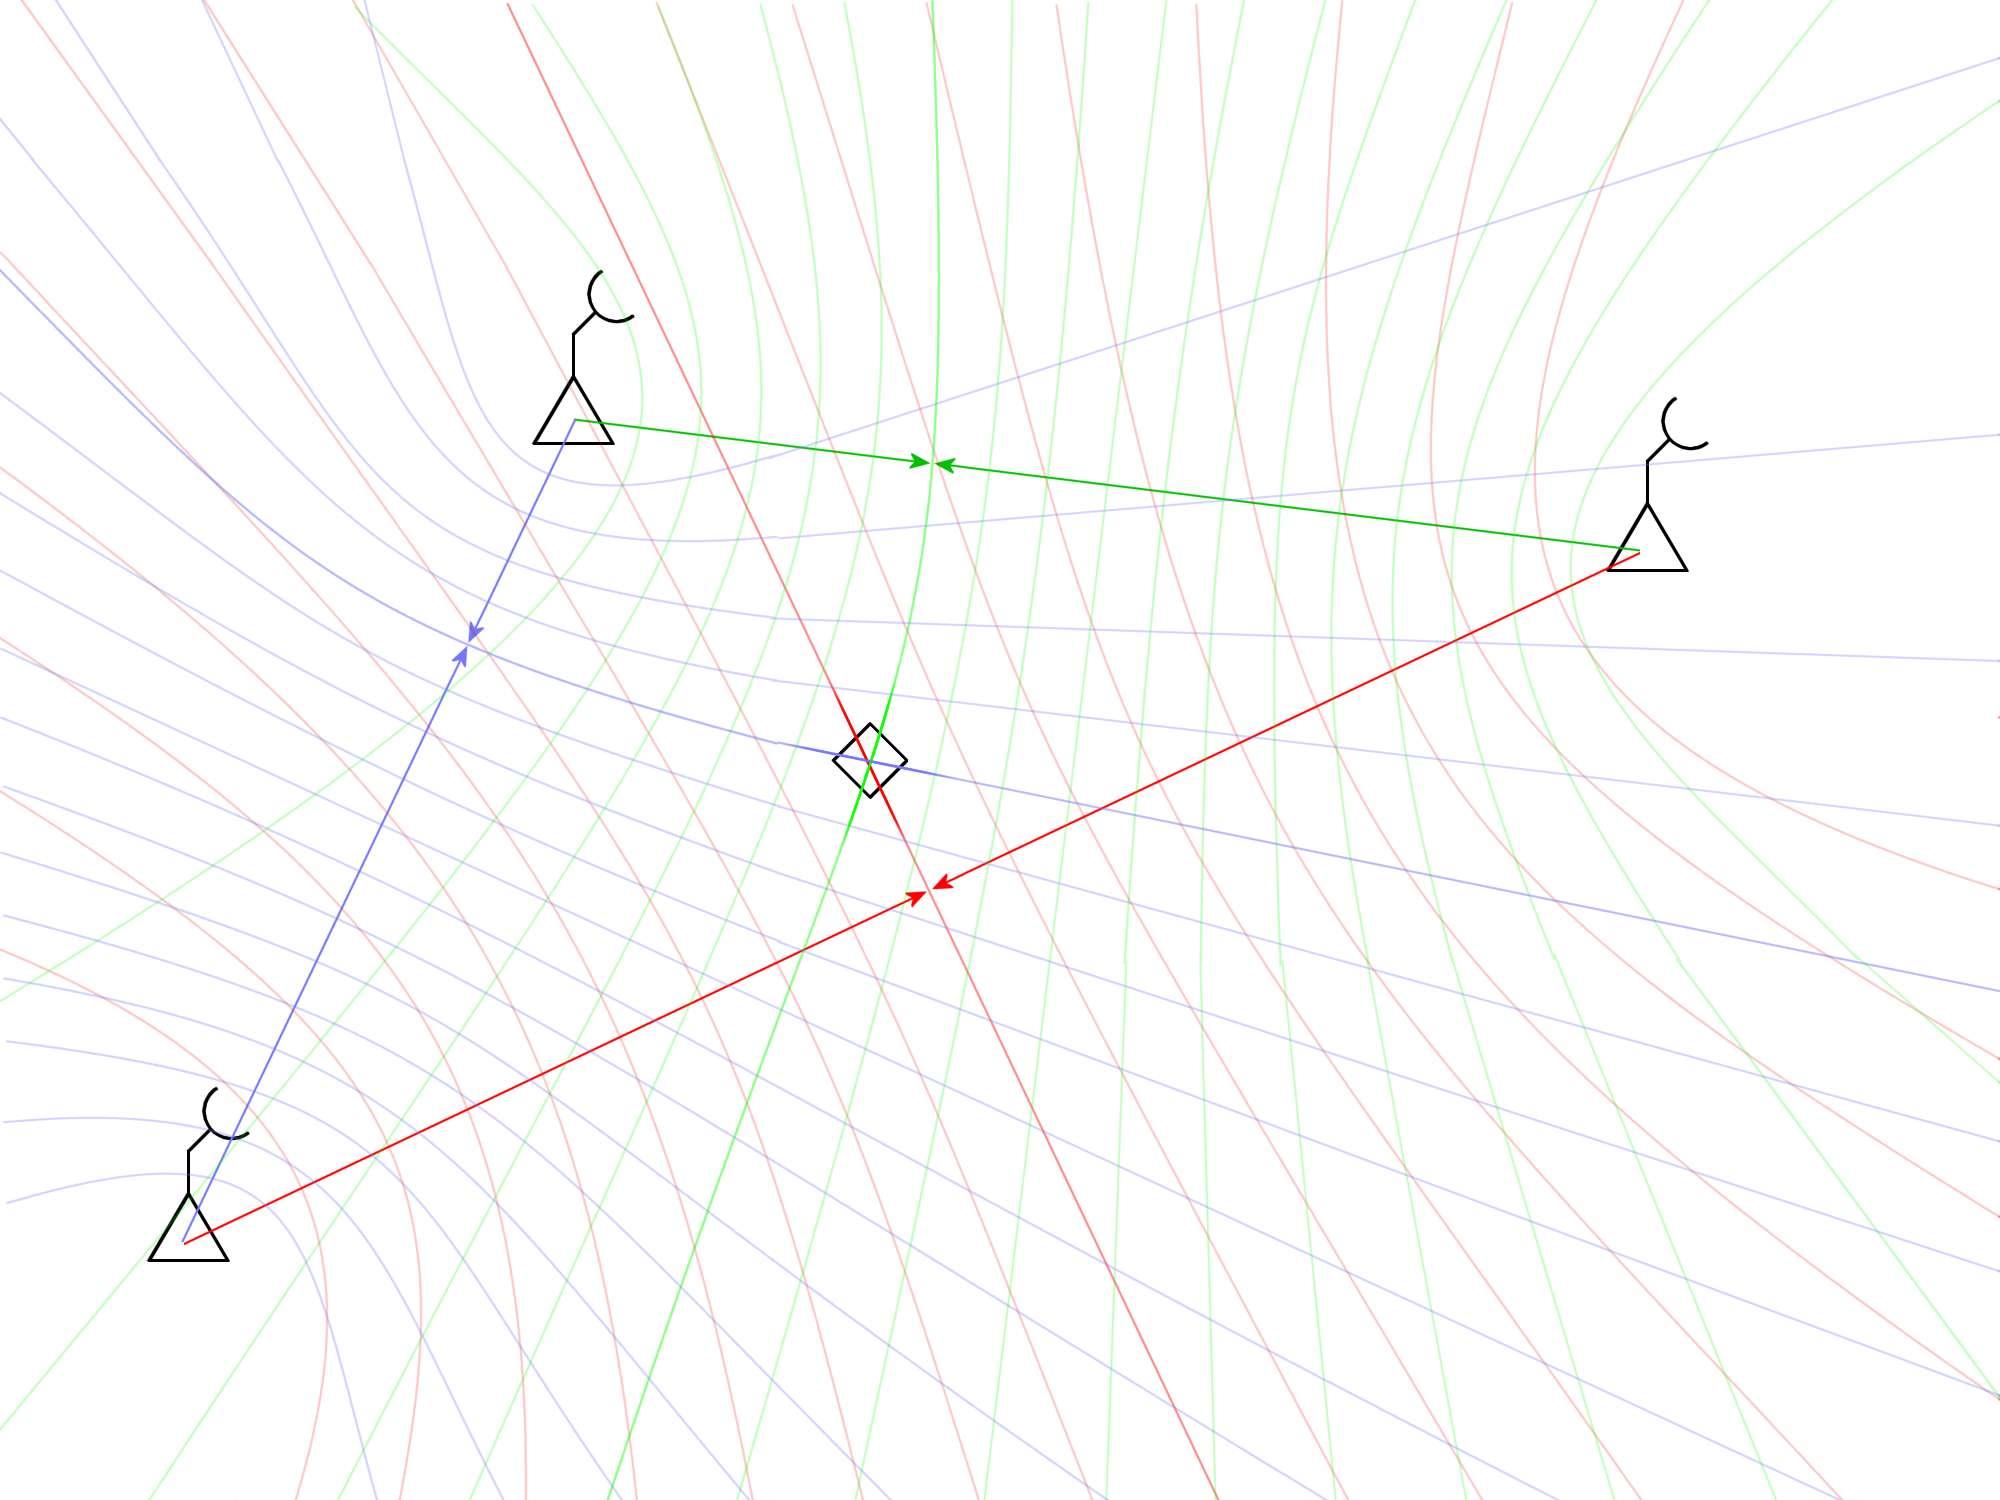 Entfernungsmessung Mit Radar : Radar basics multilateration